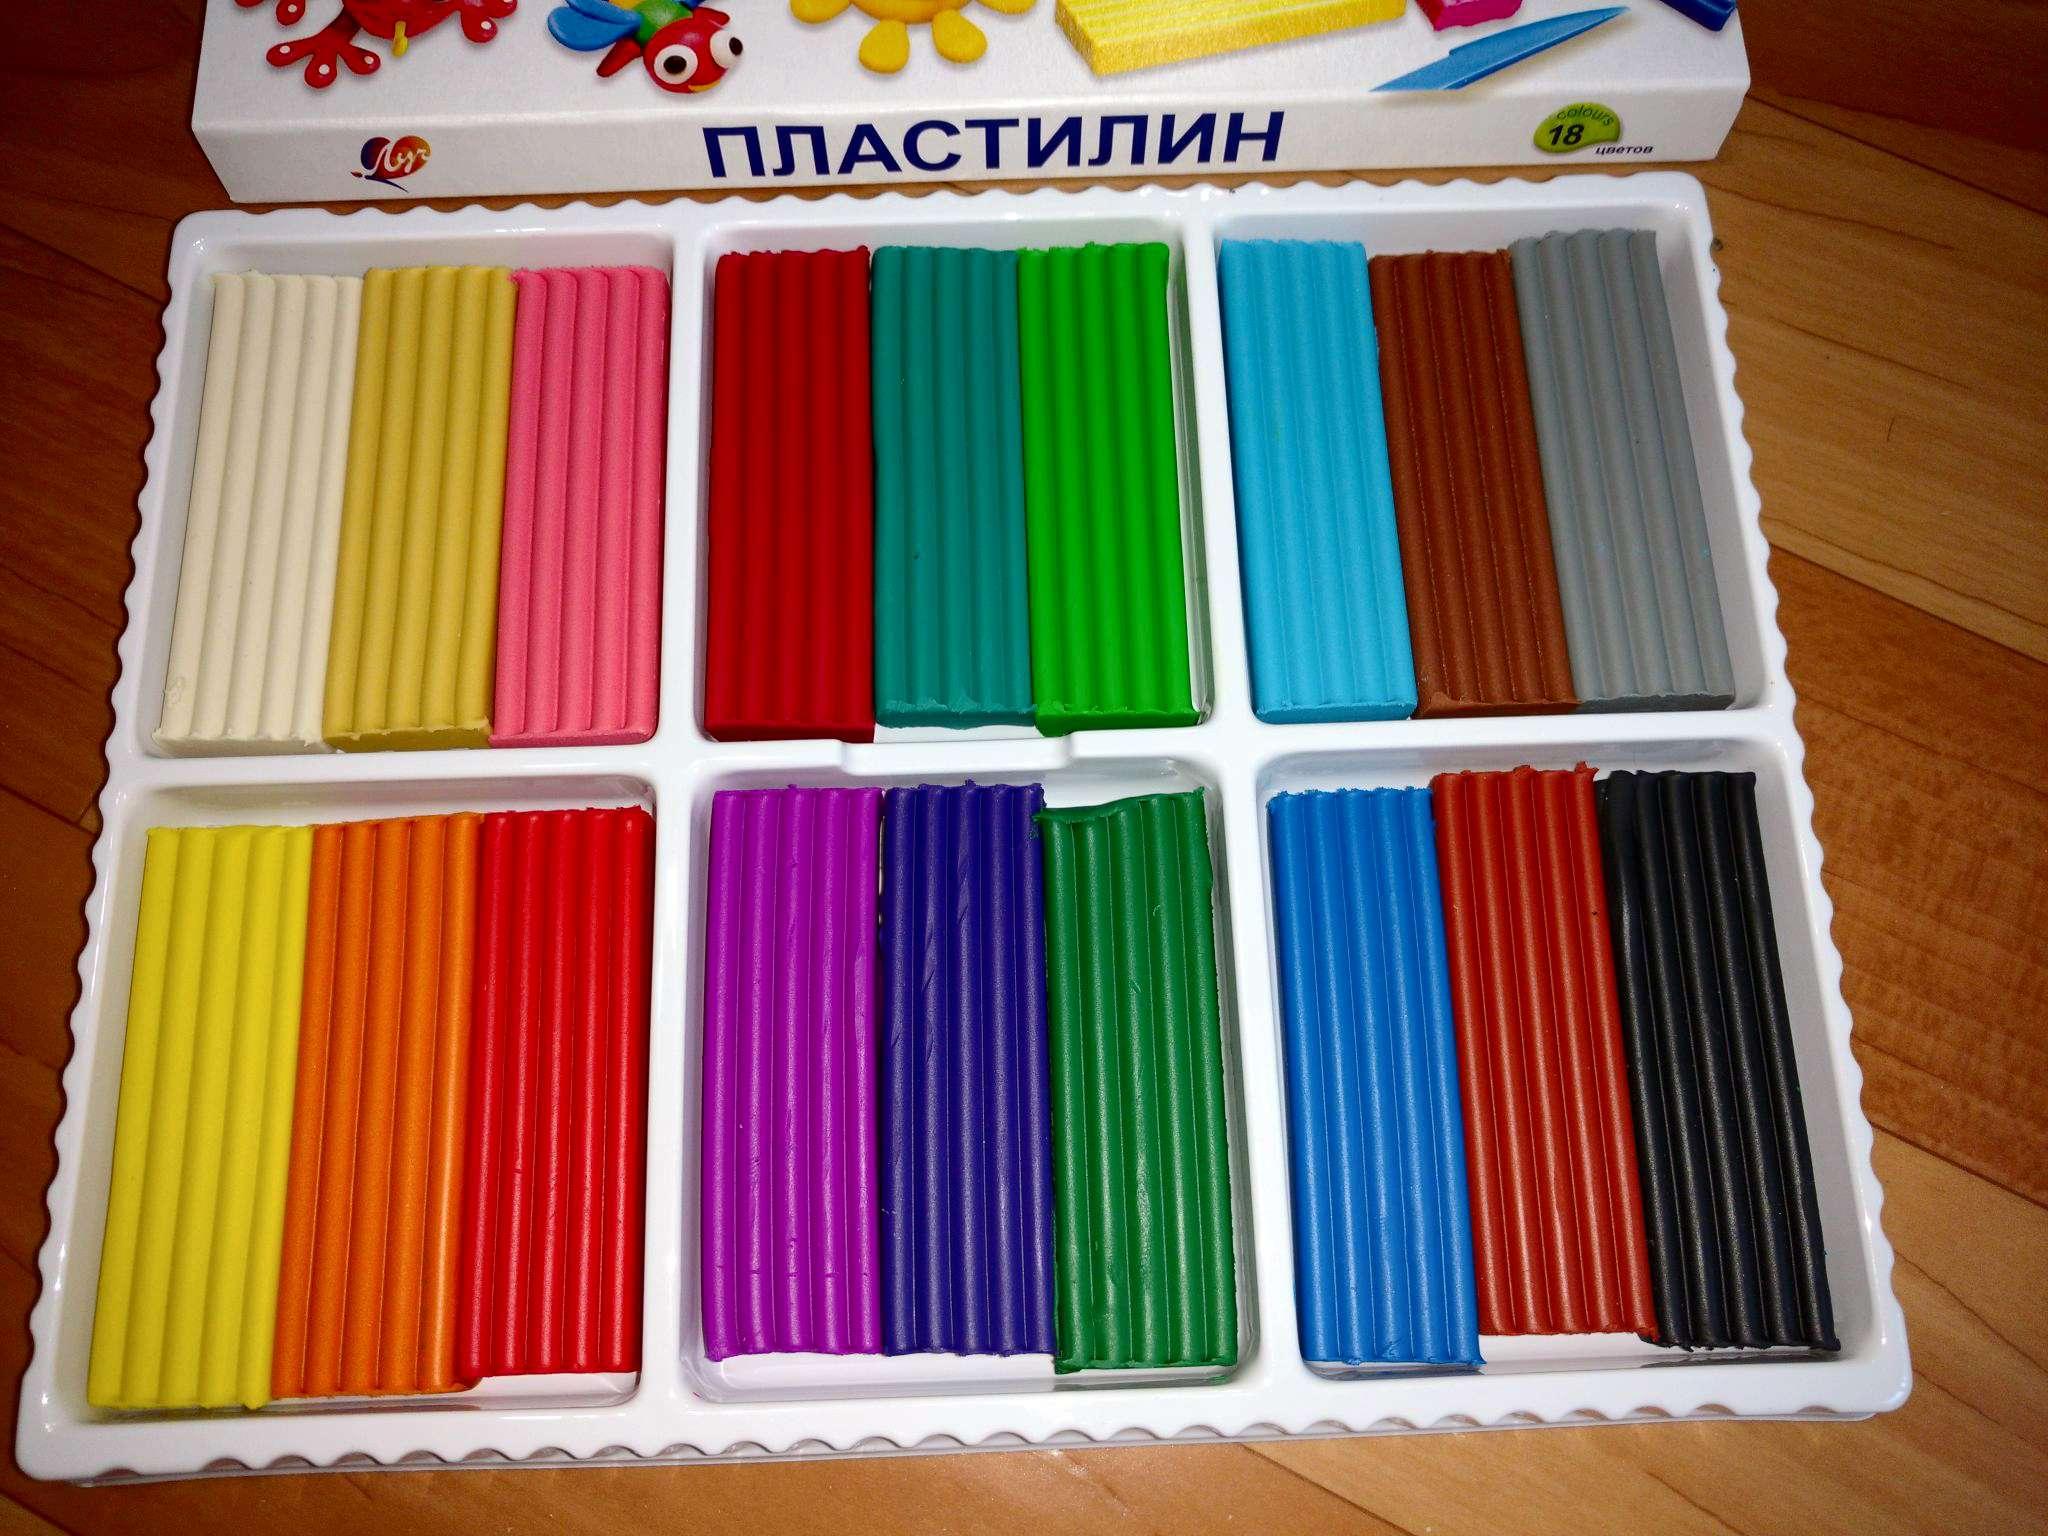 Картинки пластилина коробки